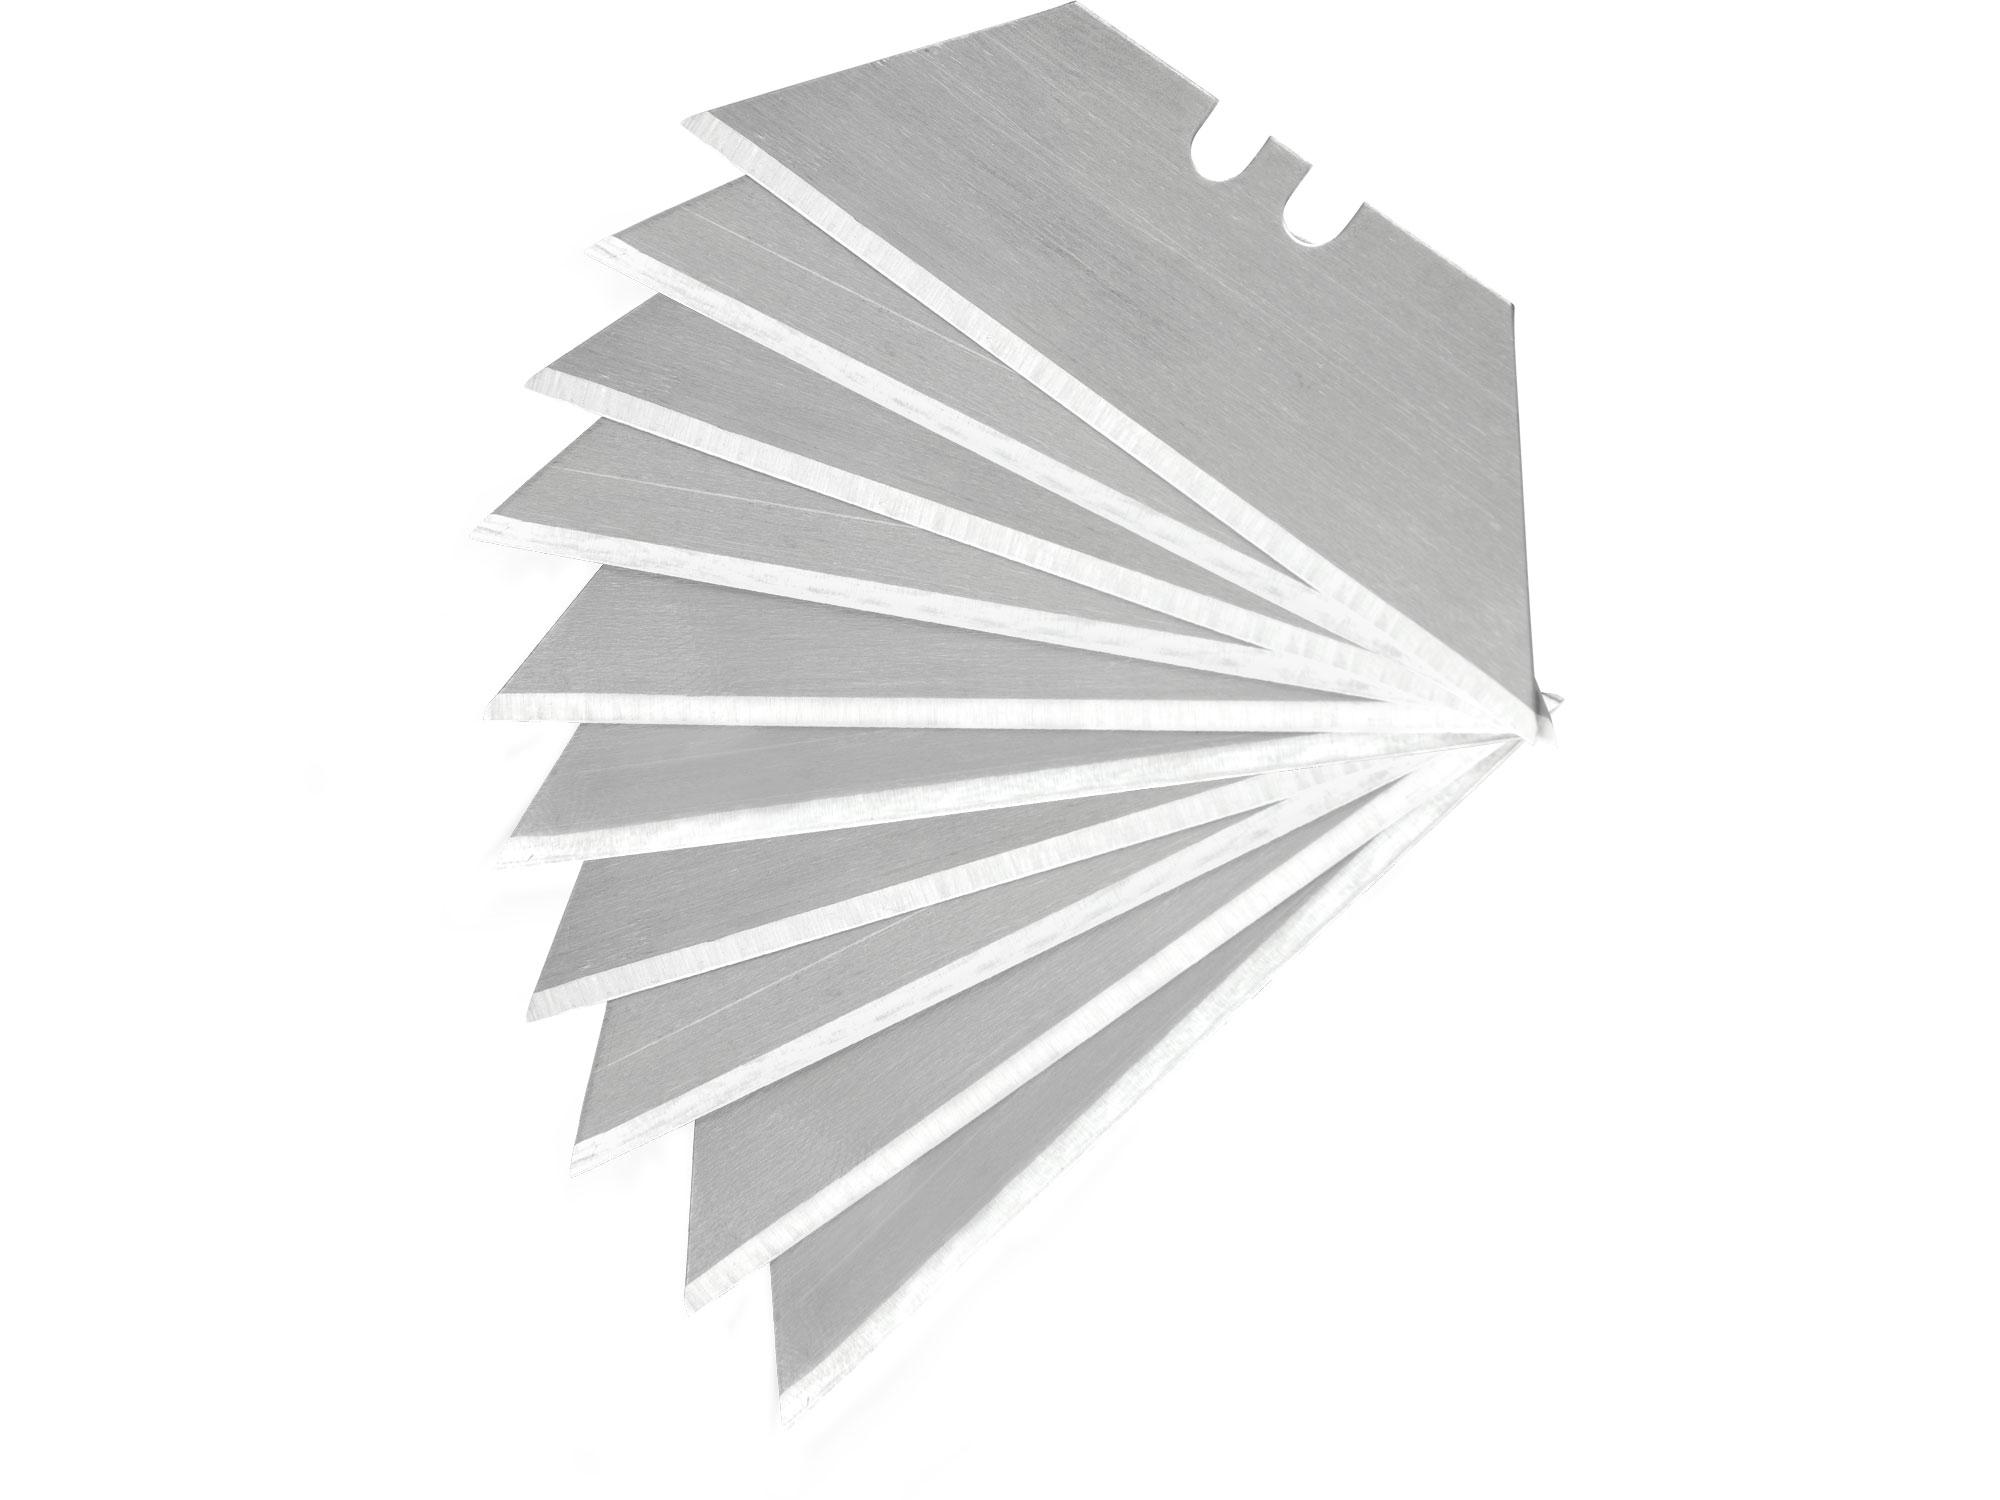 břity do nože, 19mm, 10ks, trapezoid, SK4